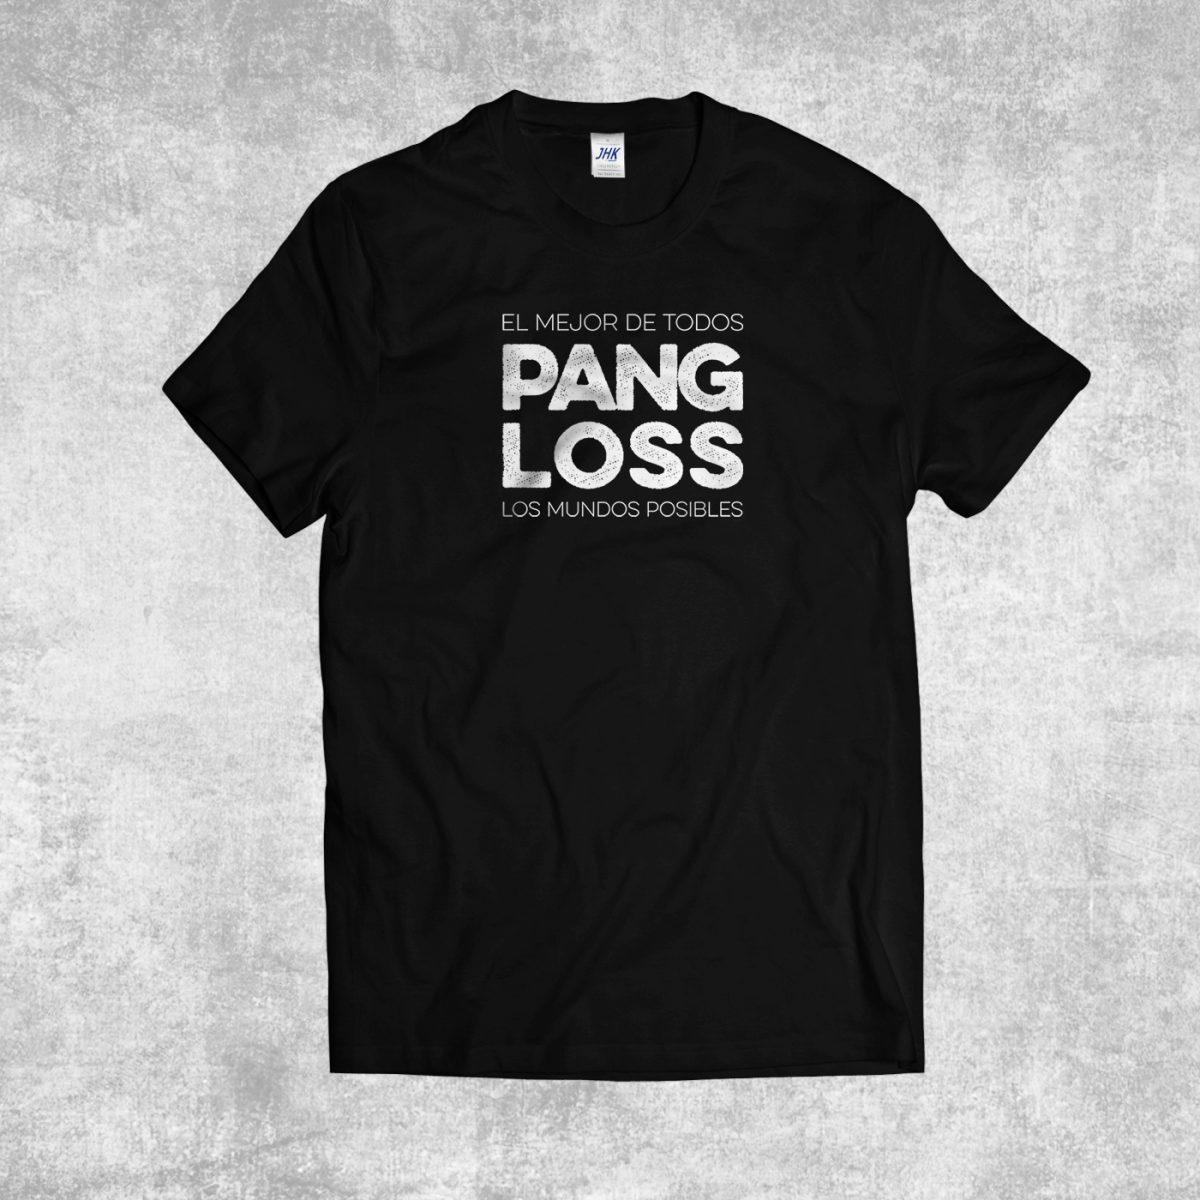 Camiseta chico Pangloss Sello Hora Zulu tienda online